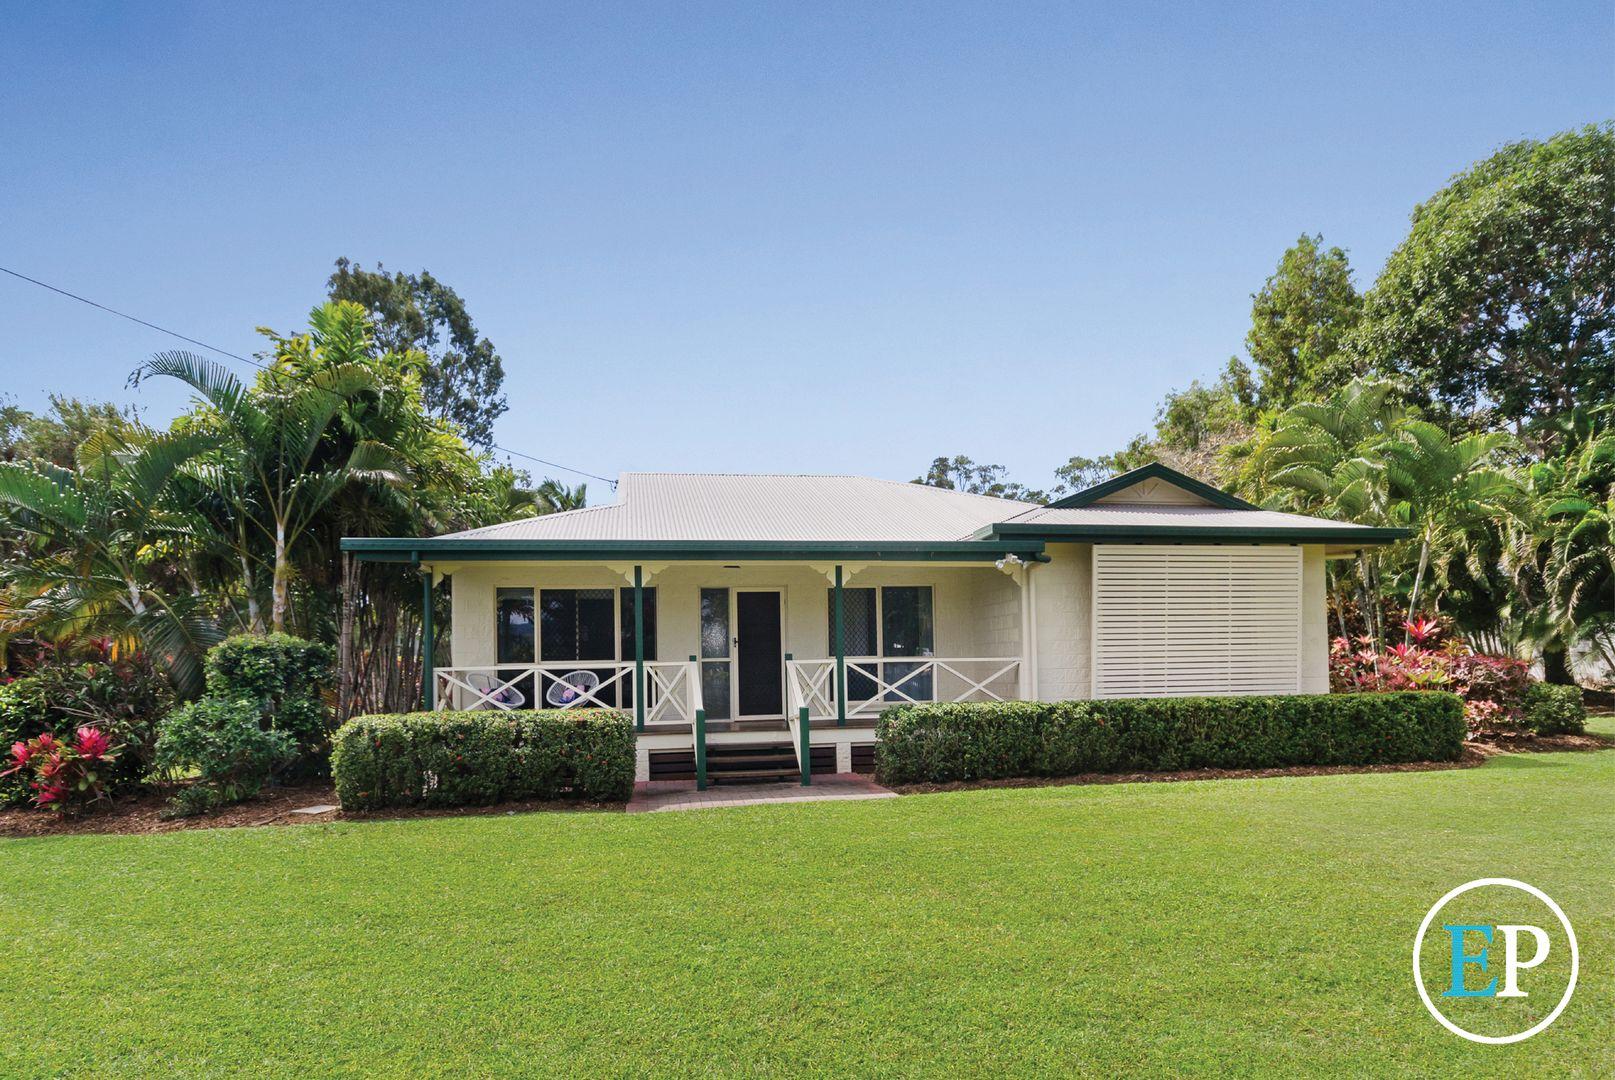 1 Benjamin Road, Rangewood QLD 4817, Image 1